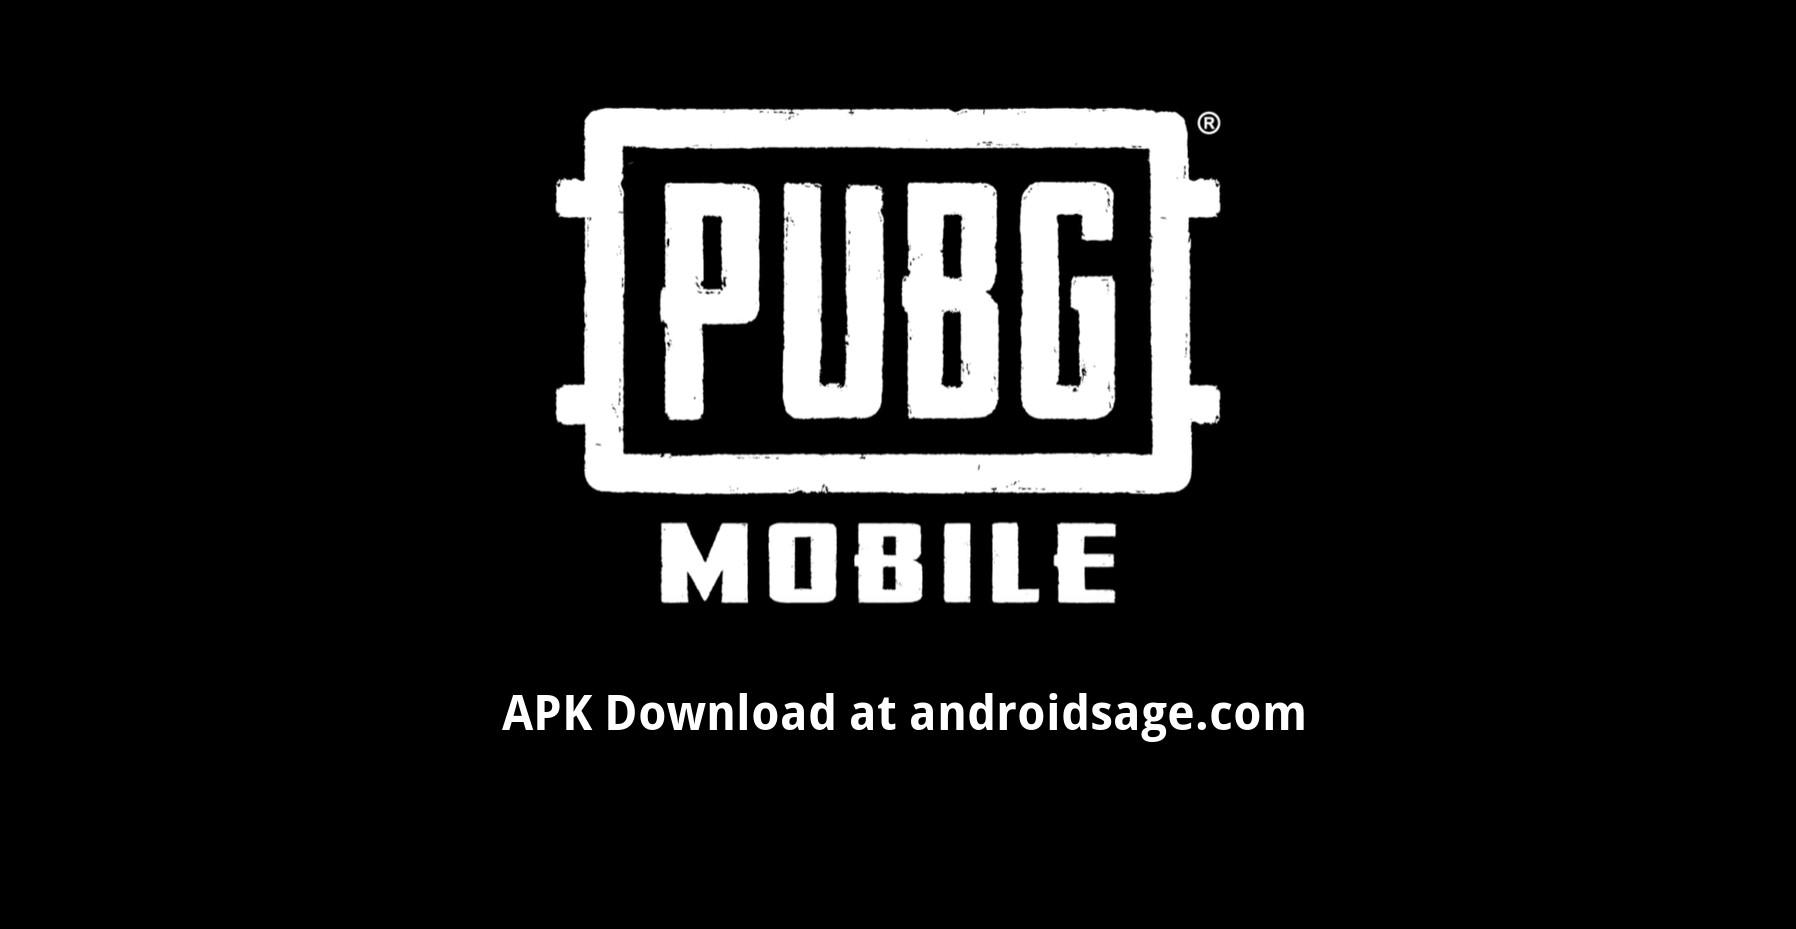 PUBG MOBILE APK download